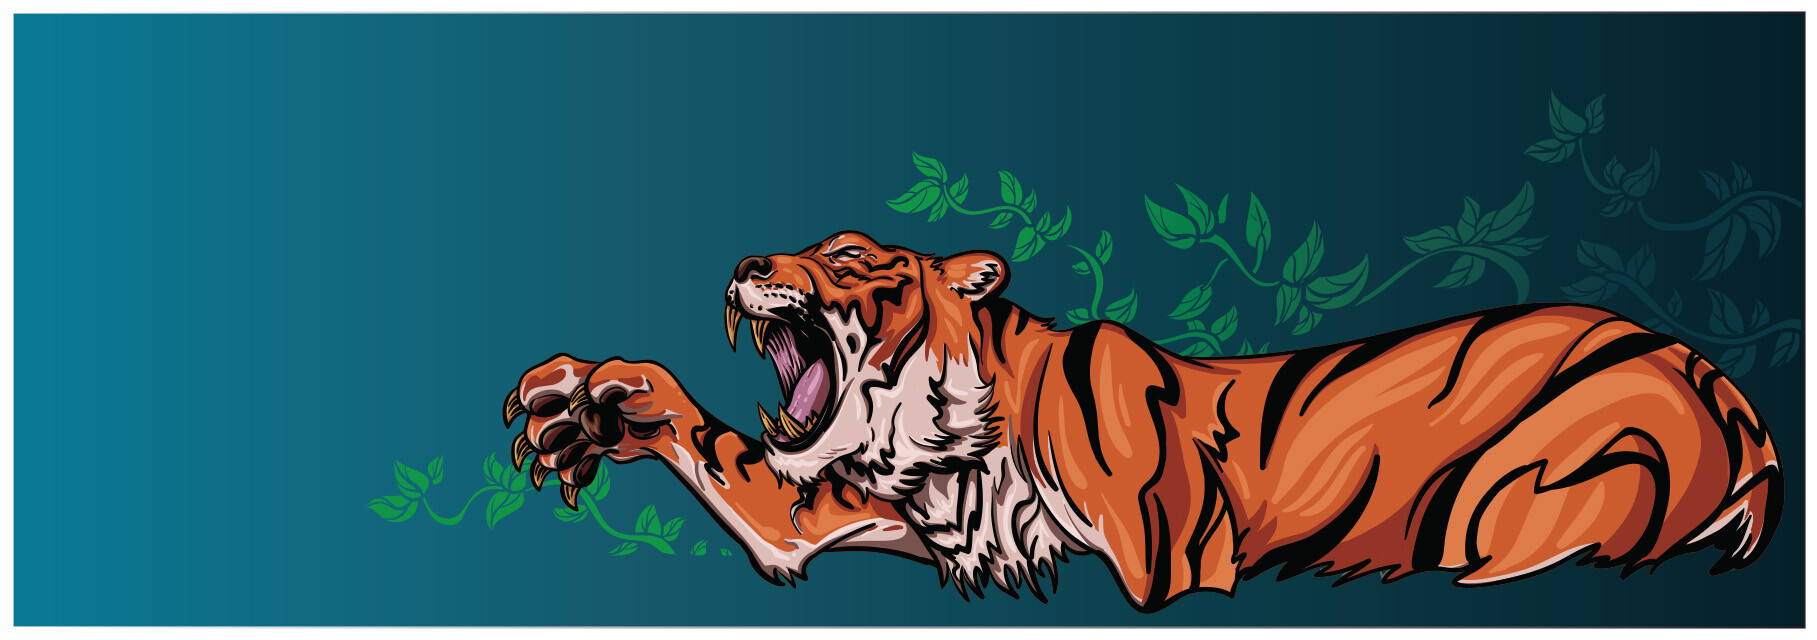 Nick valente tigerwrapmedium